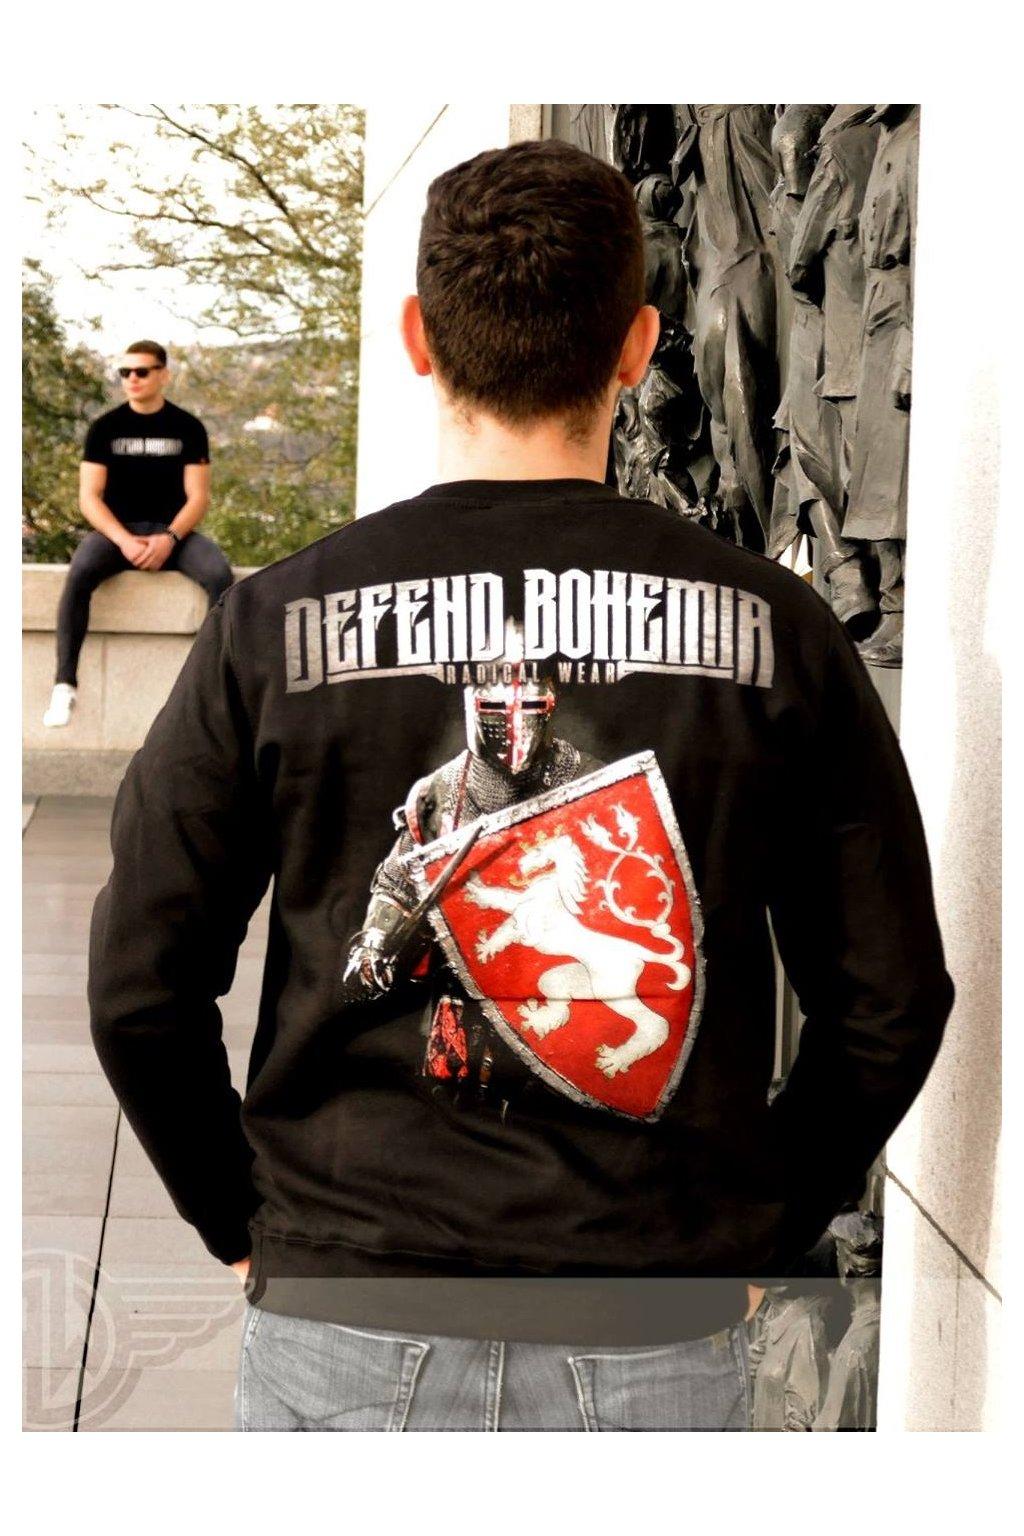 Pánská mikina Radical Defend Bohemia bez kapuce obr1